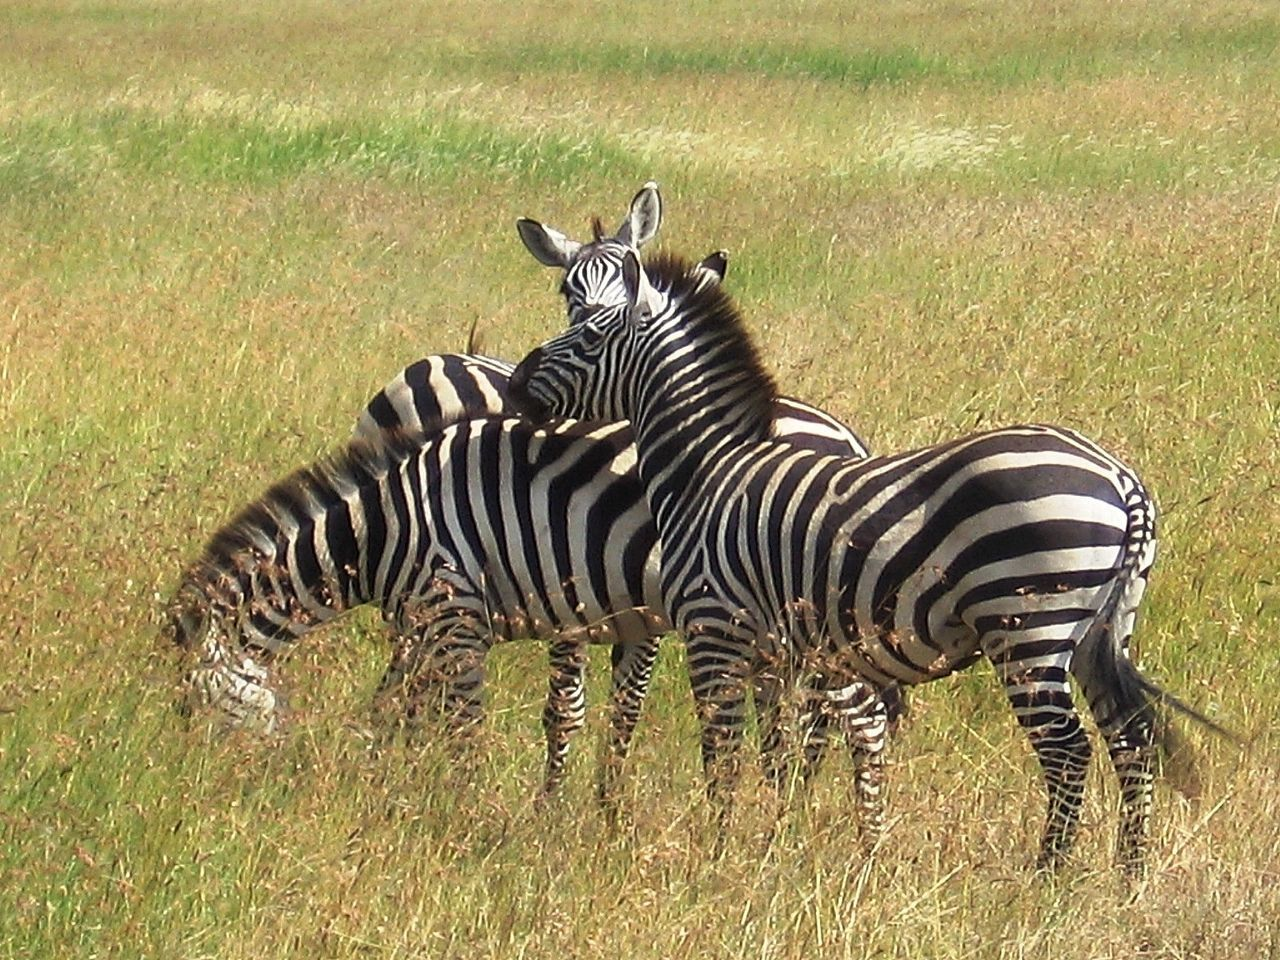 Africa African Safari Animal Themes Animal Wildlife Animals Animals In The Wild Animals In The Wild Grass Mammal Nature No People Safari Safari Animals Serengeti National Park Serengeti, Tanzania Striped Wildlife Wildlife & Nature Wildlife Photography Zebra